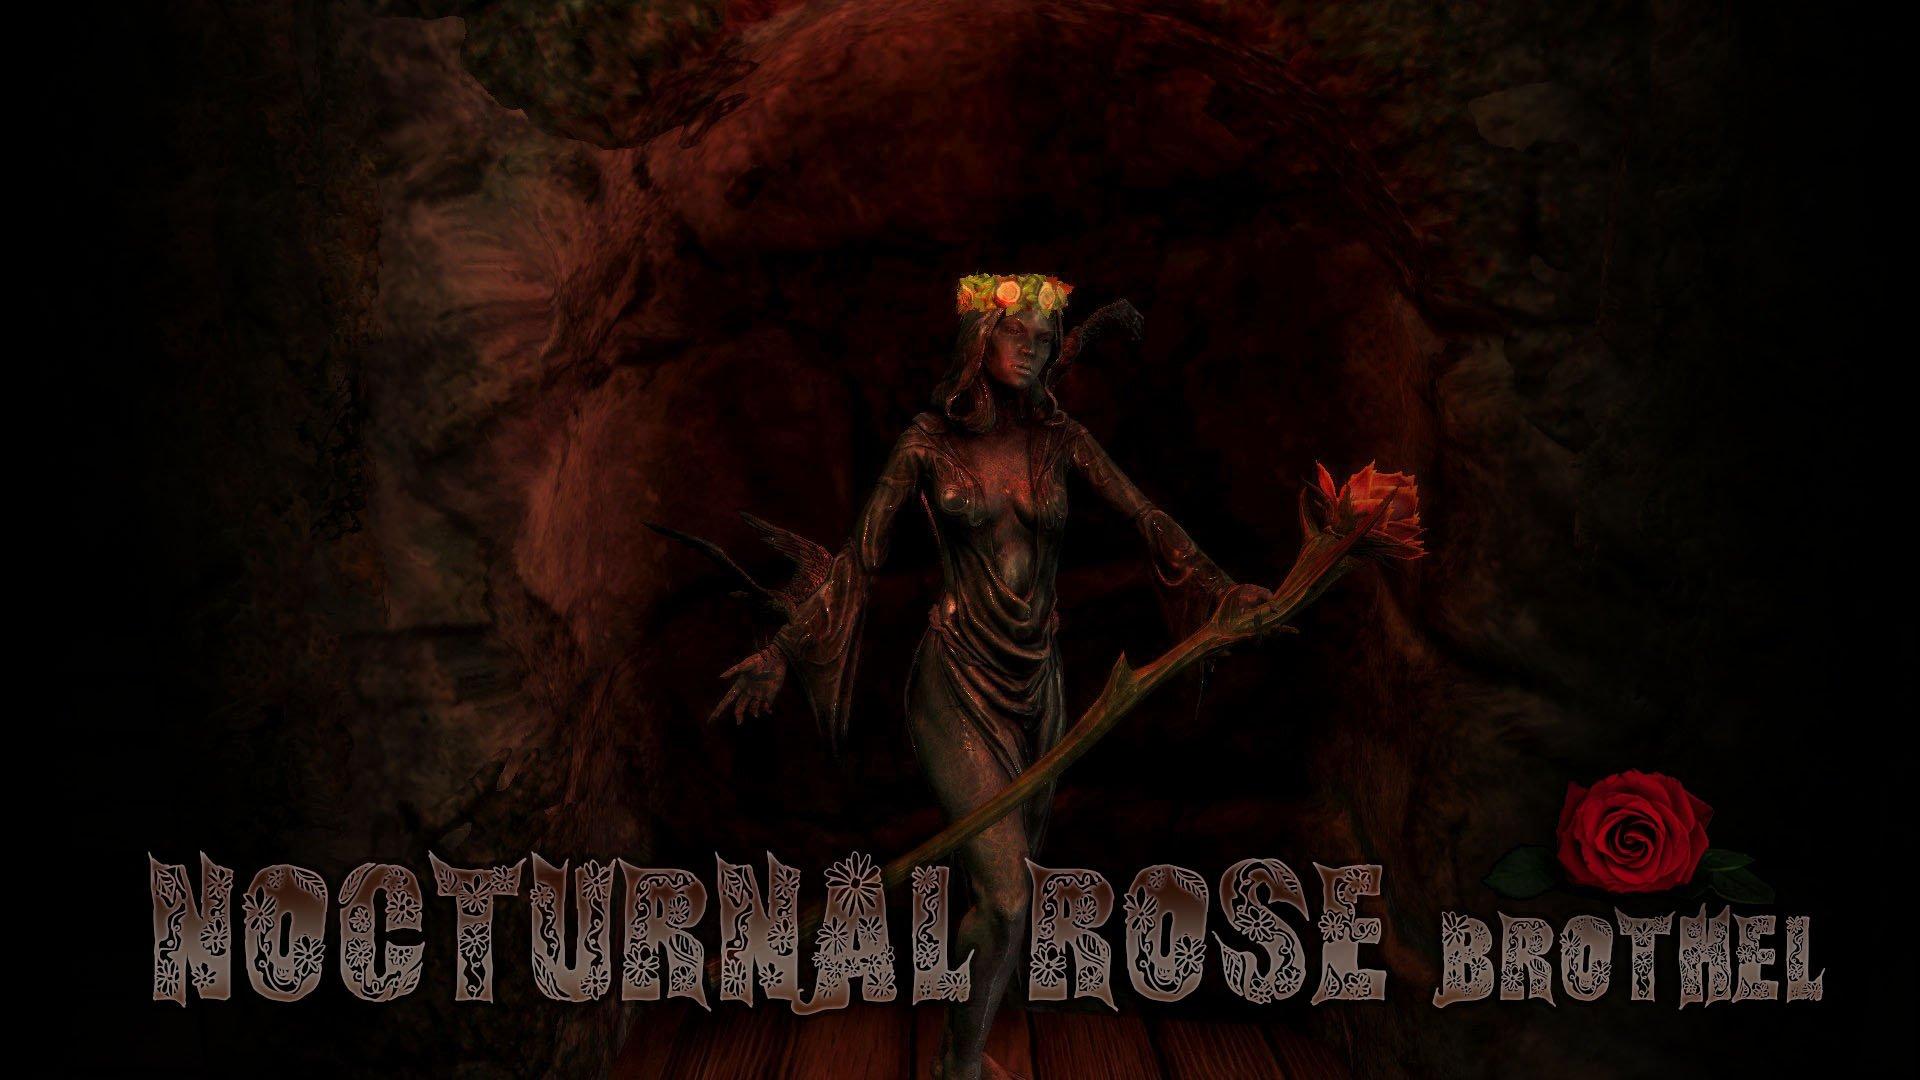 Nocturnal Rose Brothel Rus